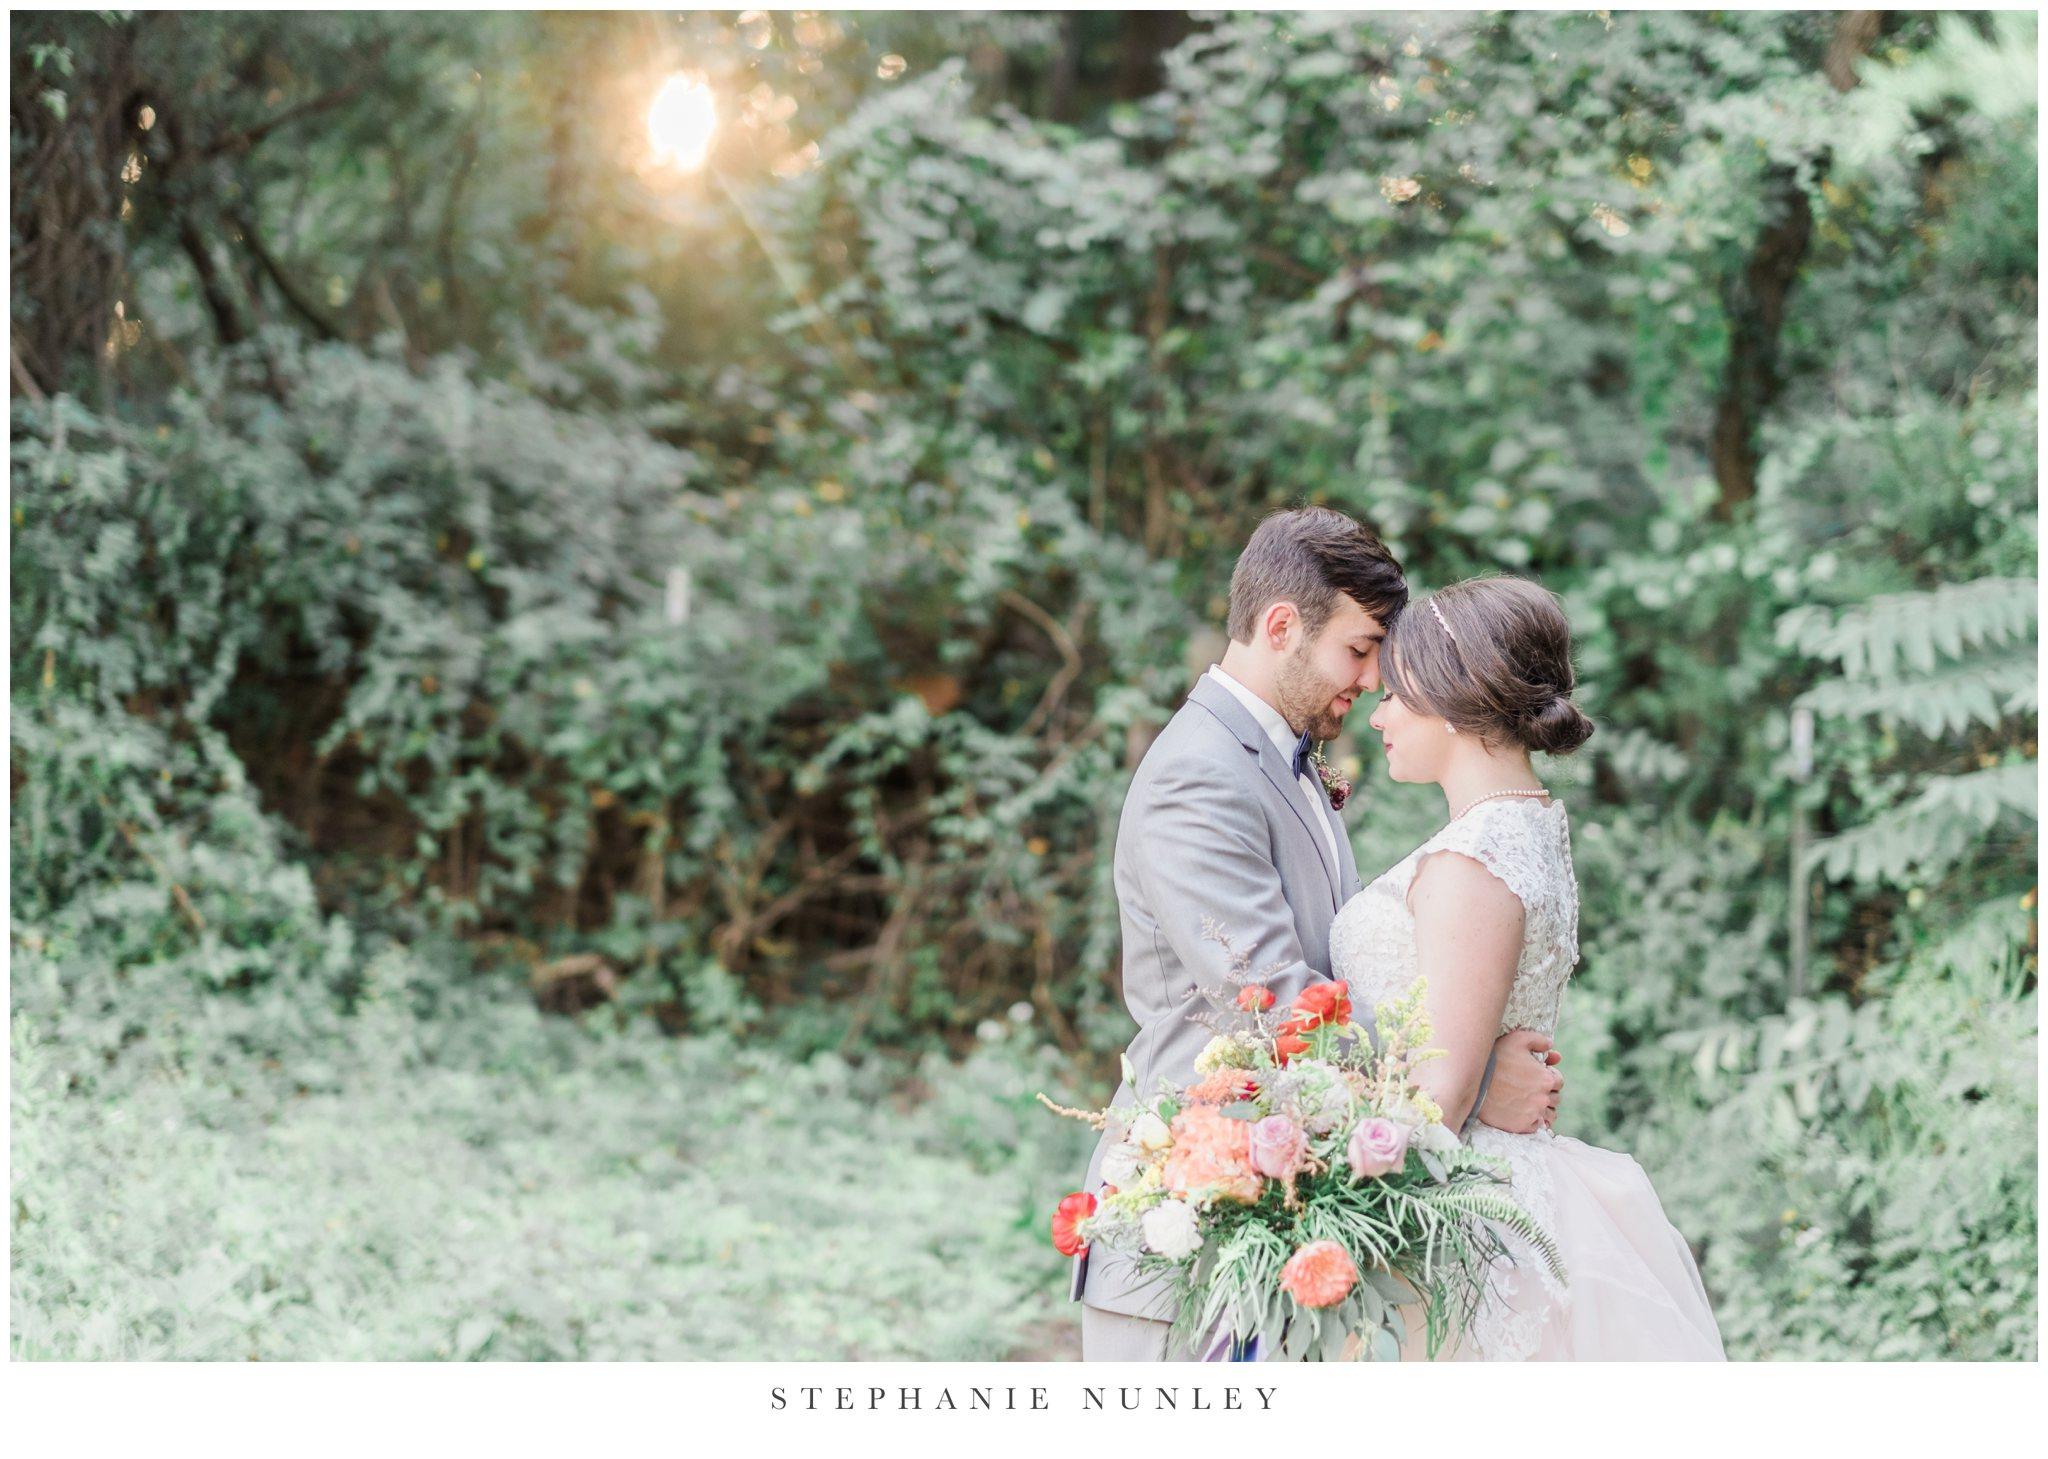 arkansas-wedding-with-lush-wildflower-bouquet-0137.jpg